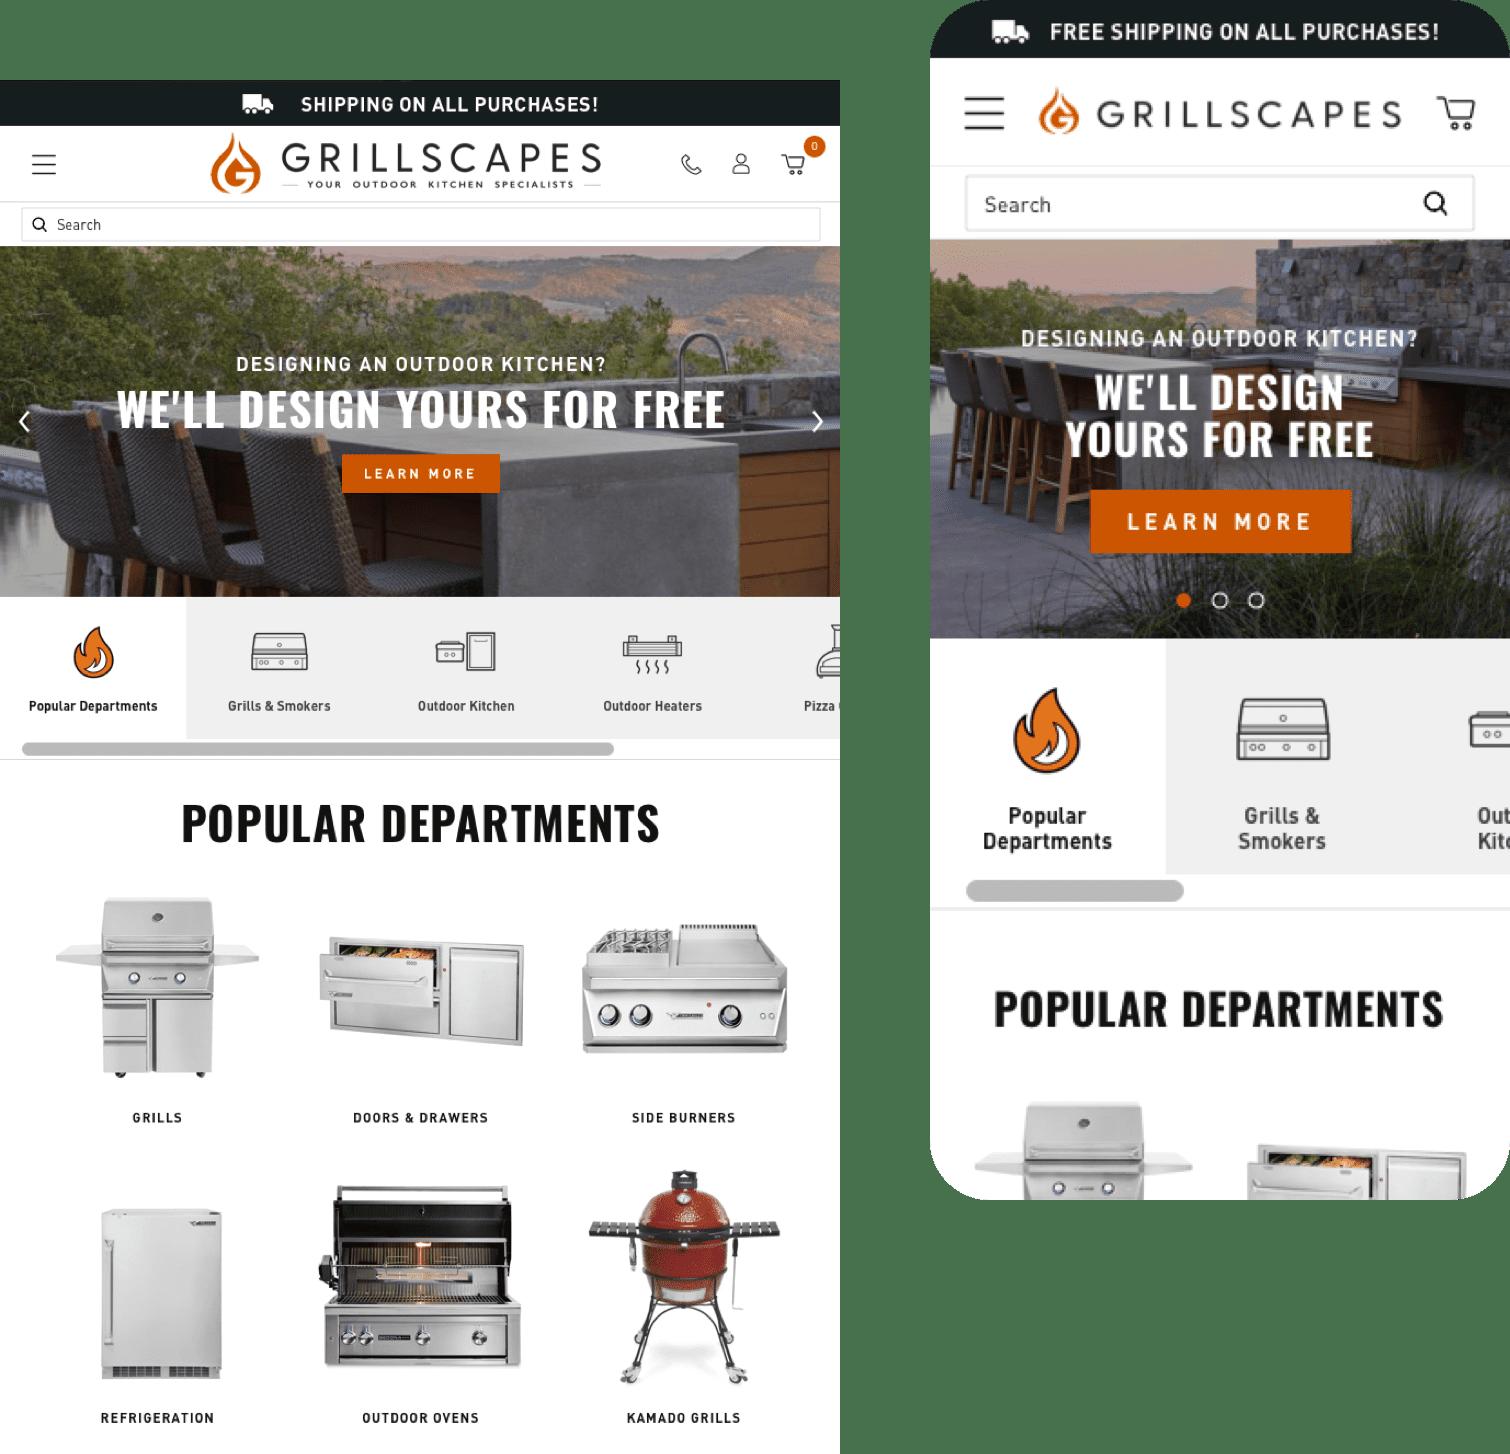 Grillscapes Mobile